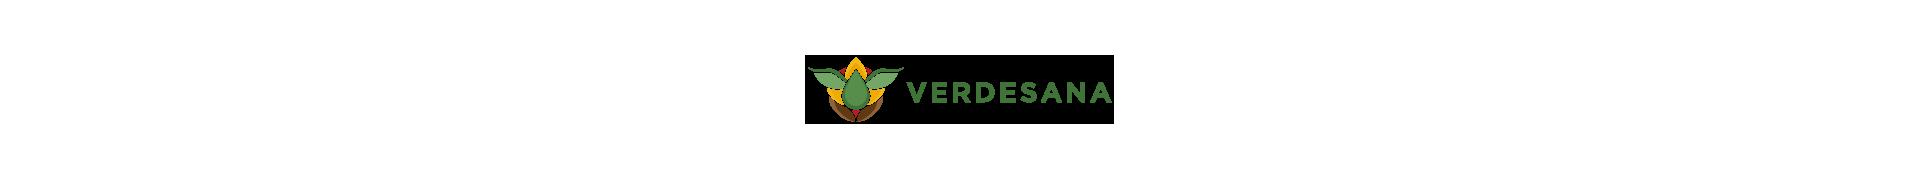 Verdesana